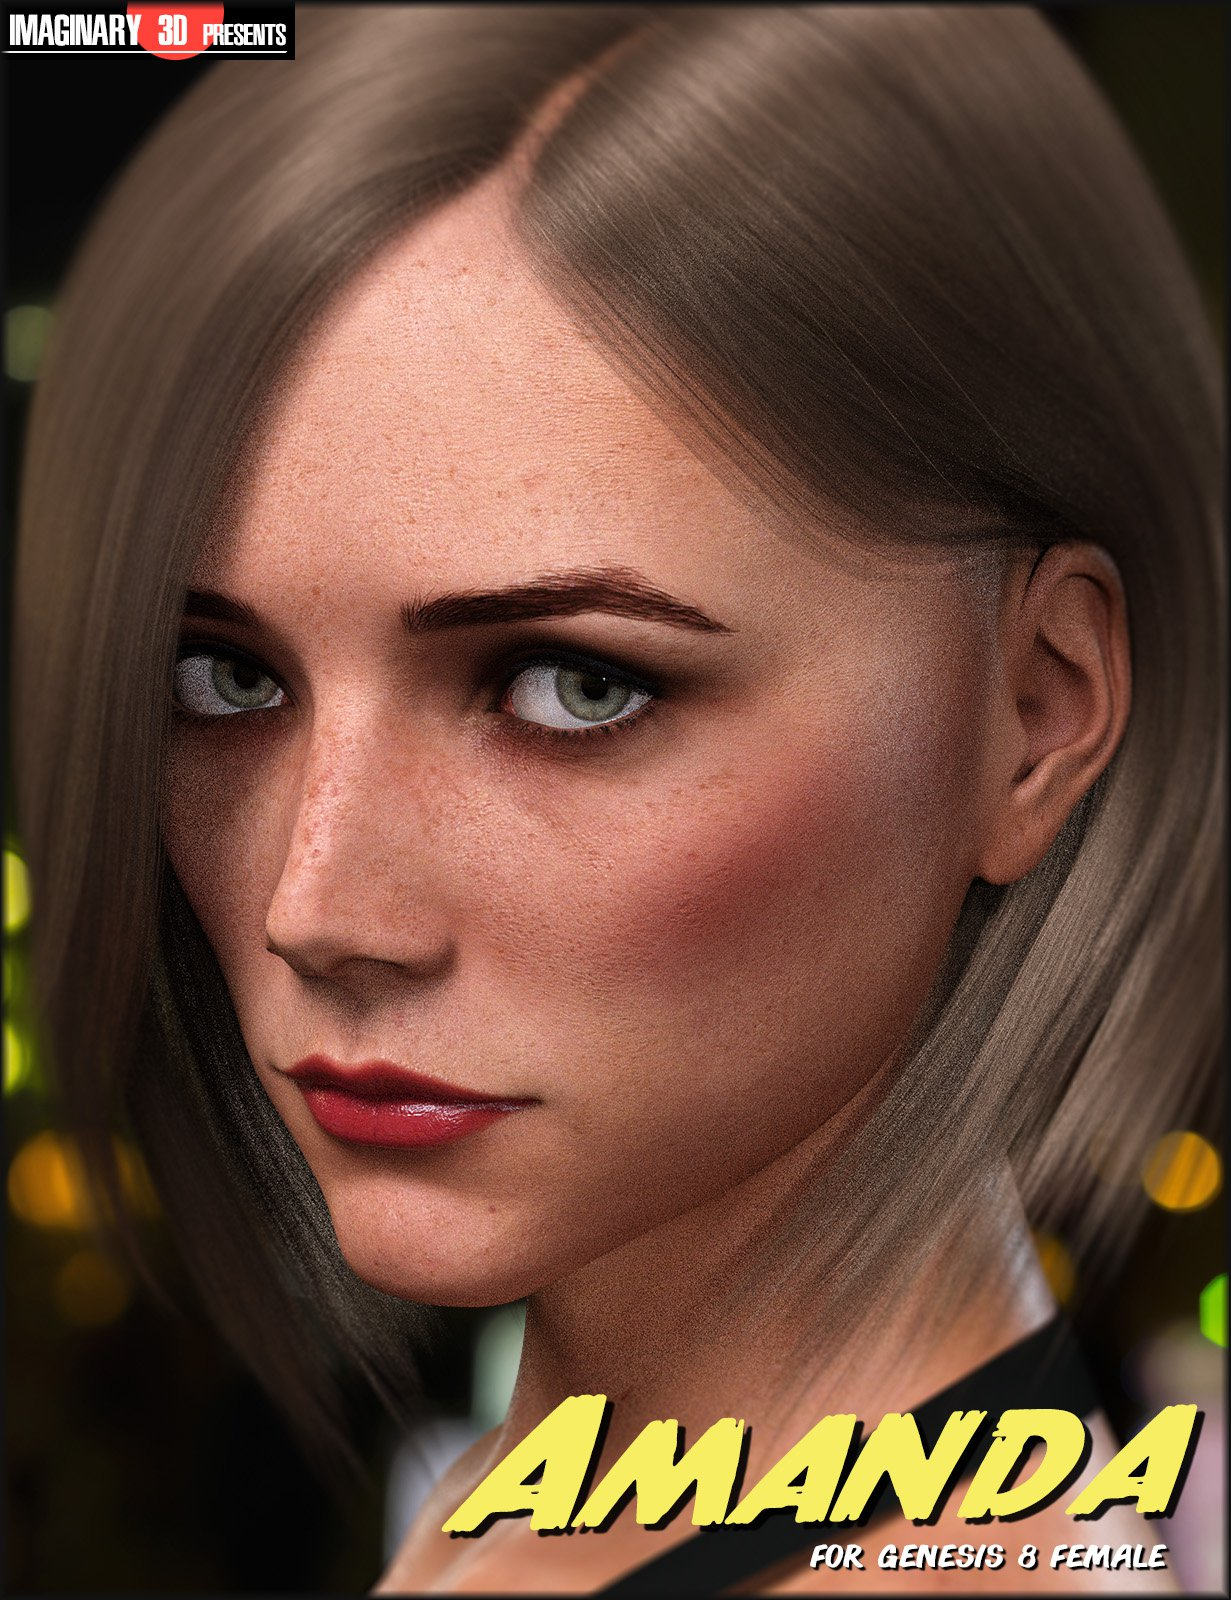 Amanda for Genesis 8 Female_DAZ3D下载站